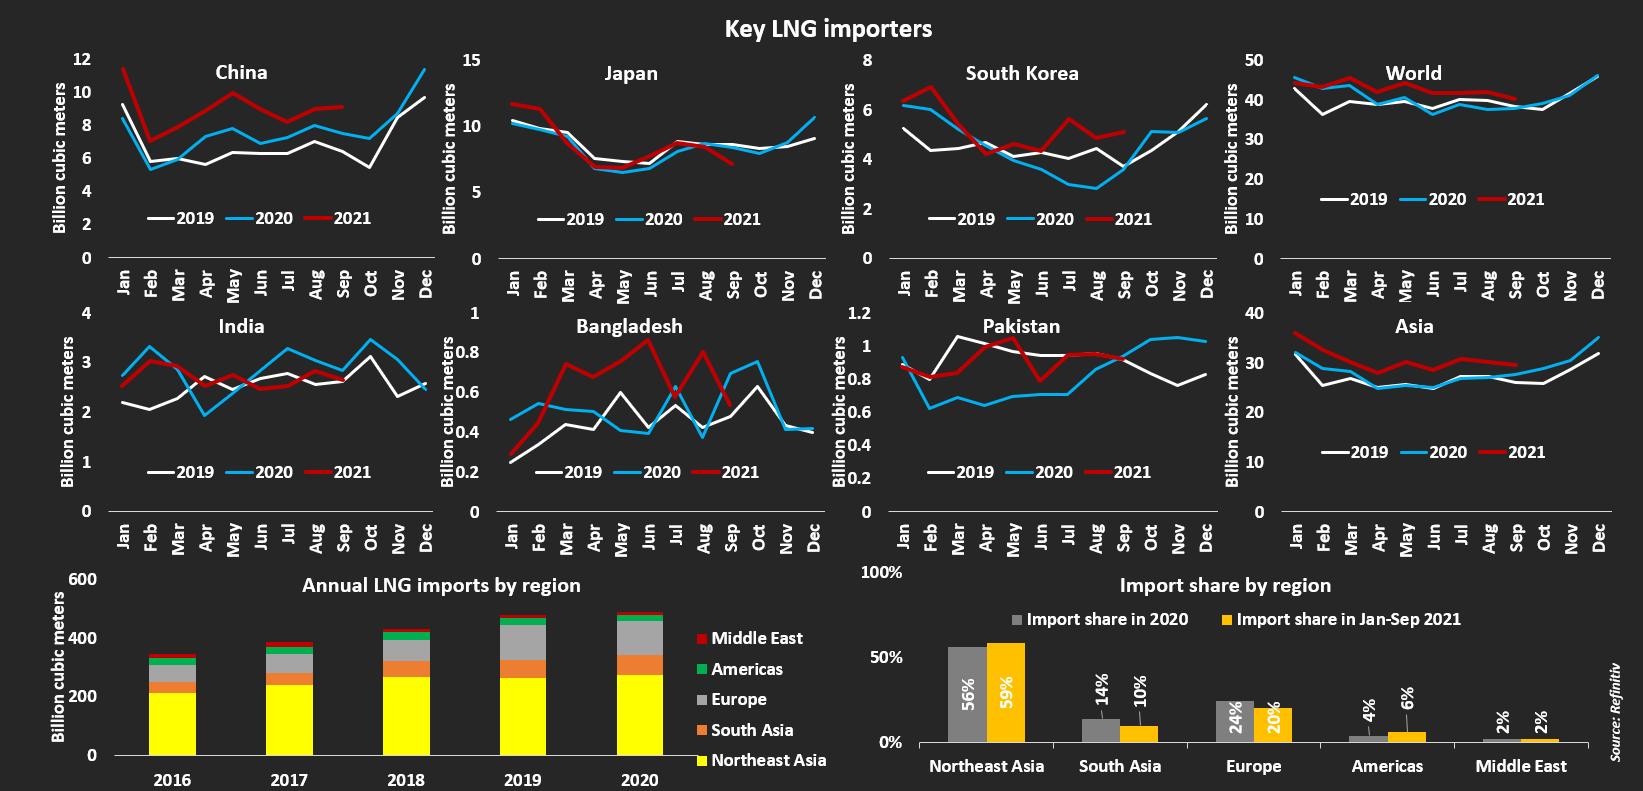 Key LNG importers